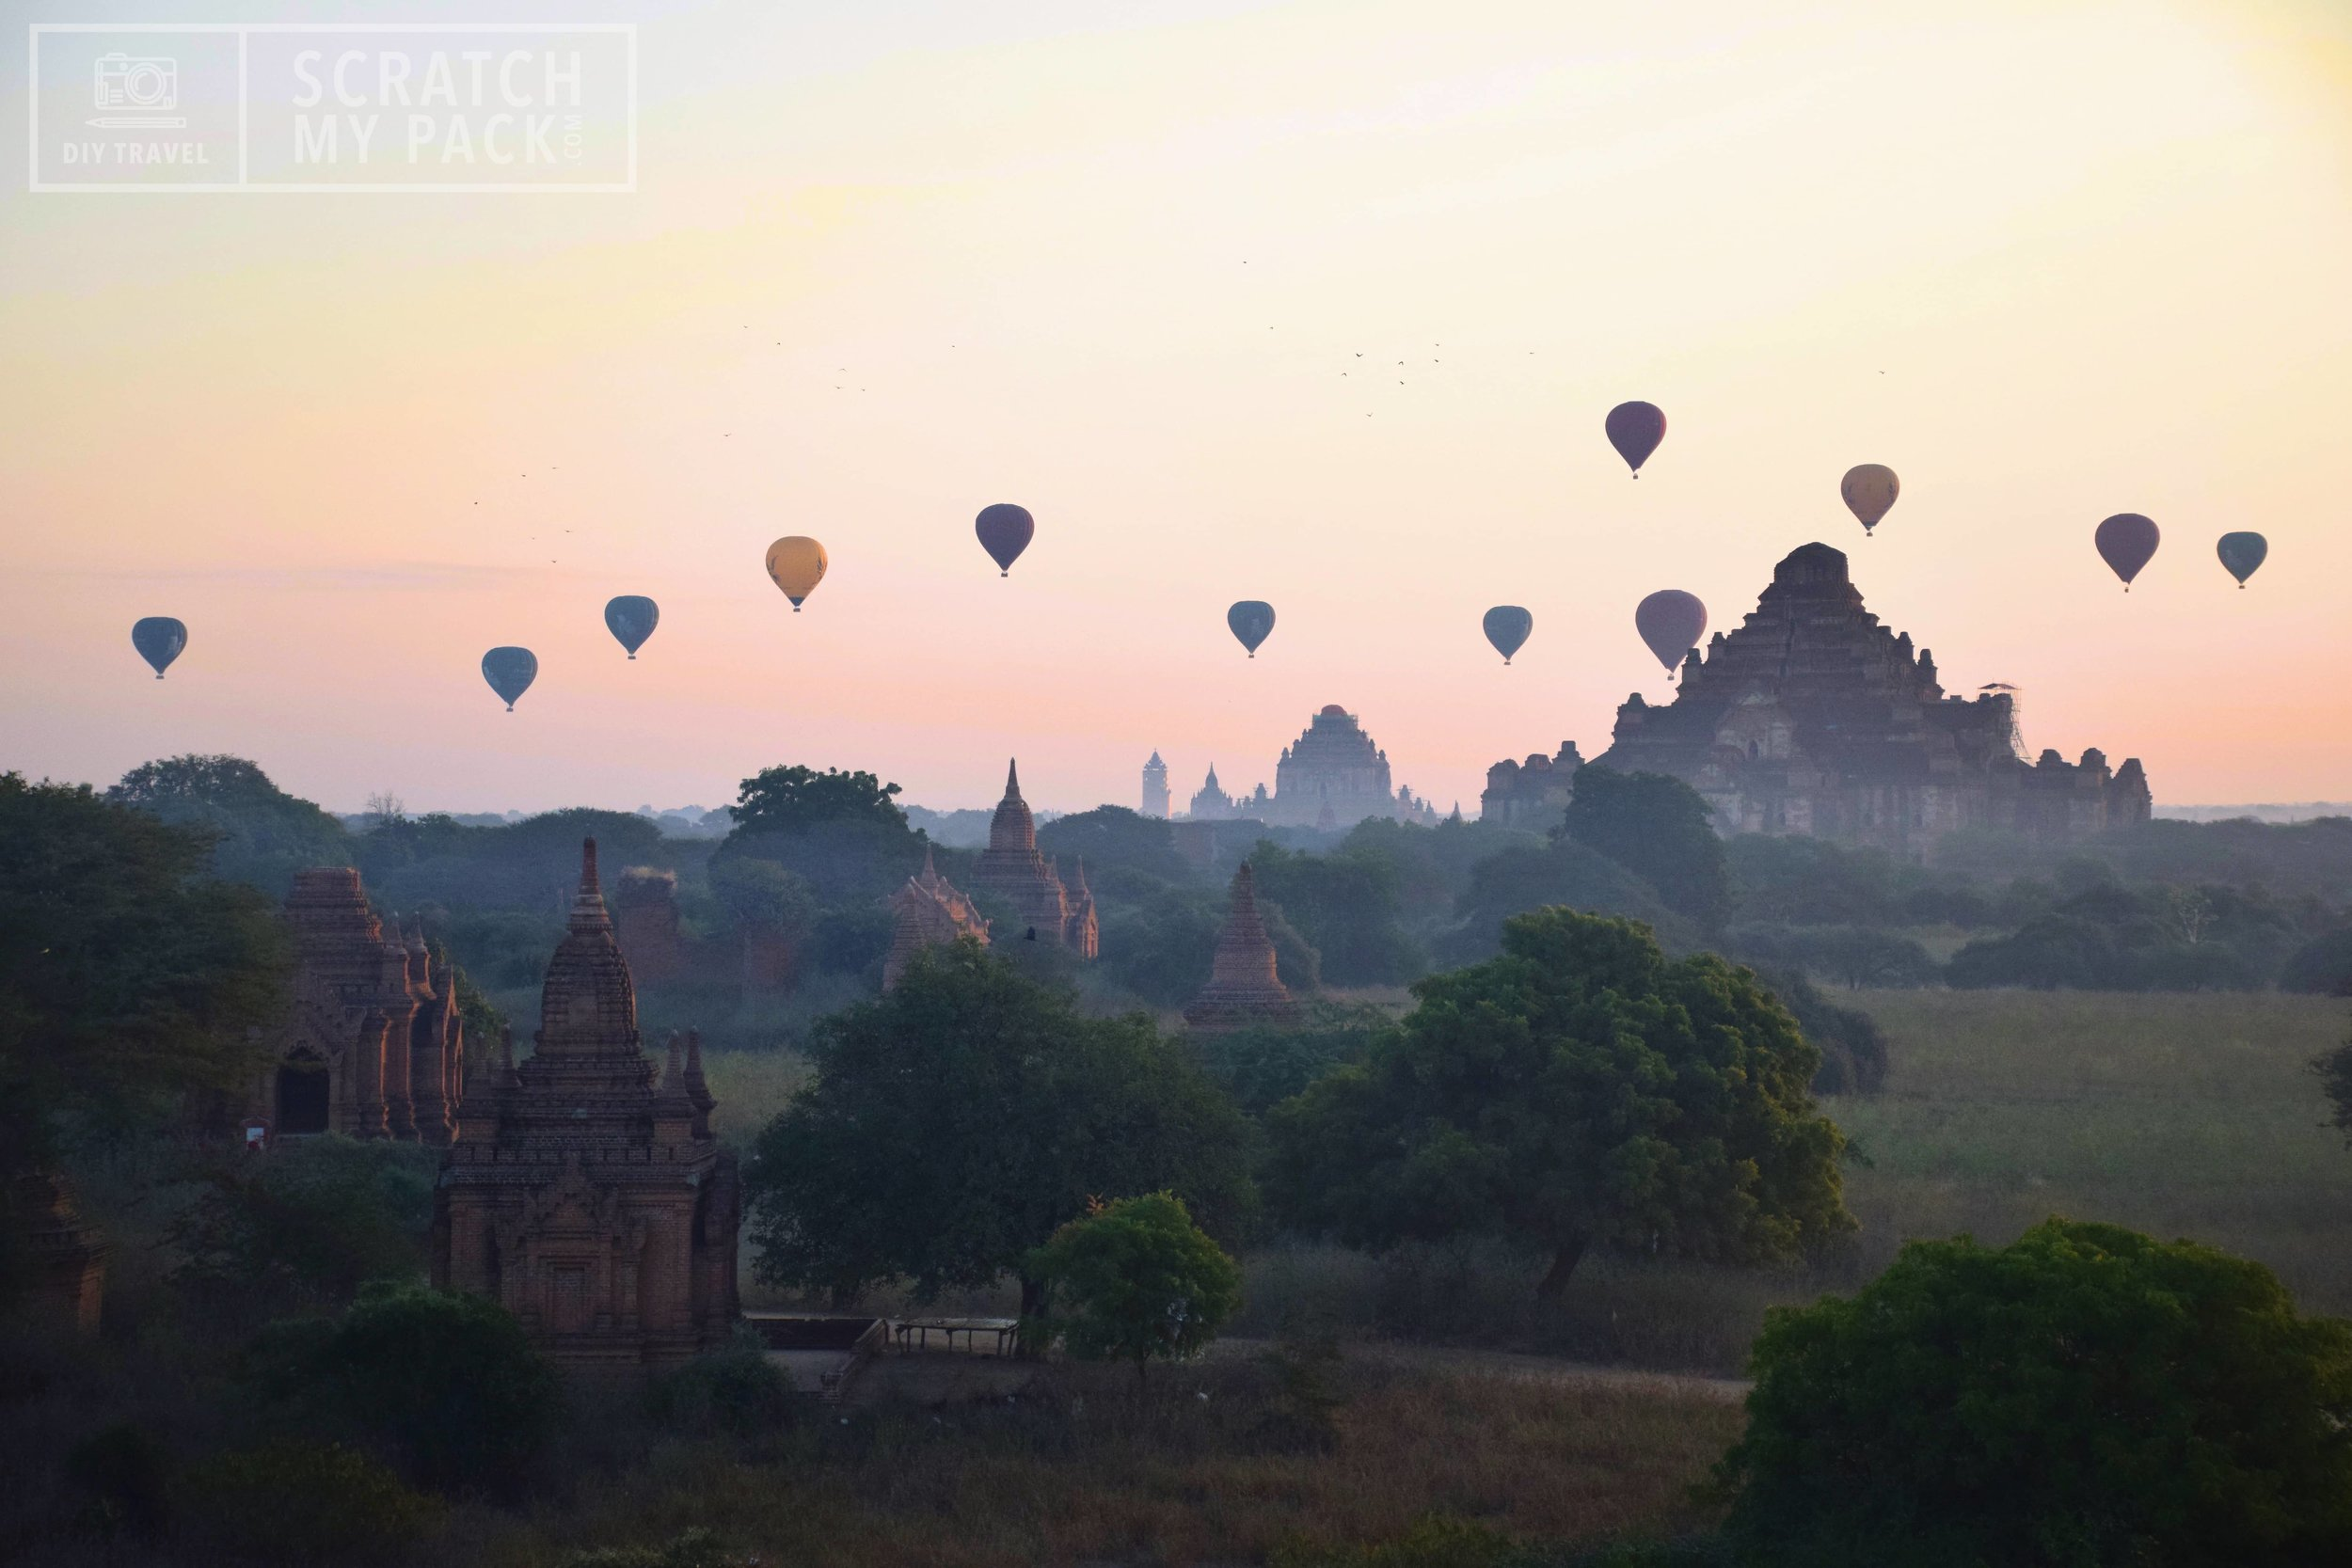 Bagan: Take a hot air balloon ride during sunrise